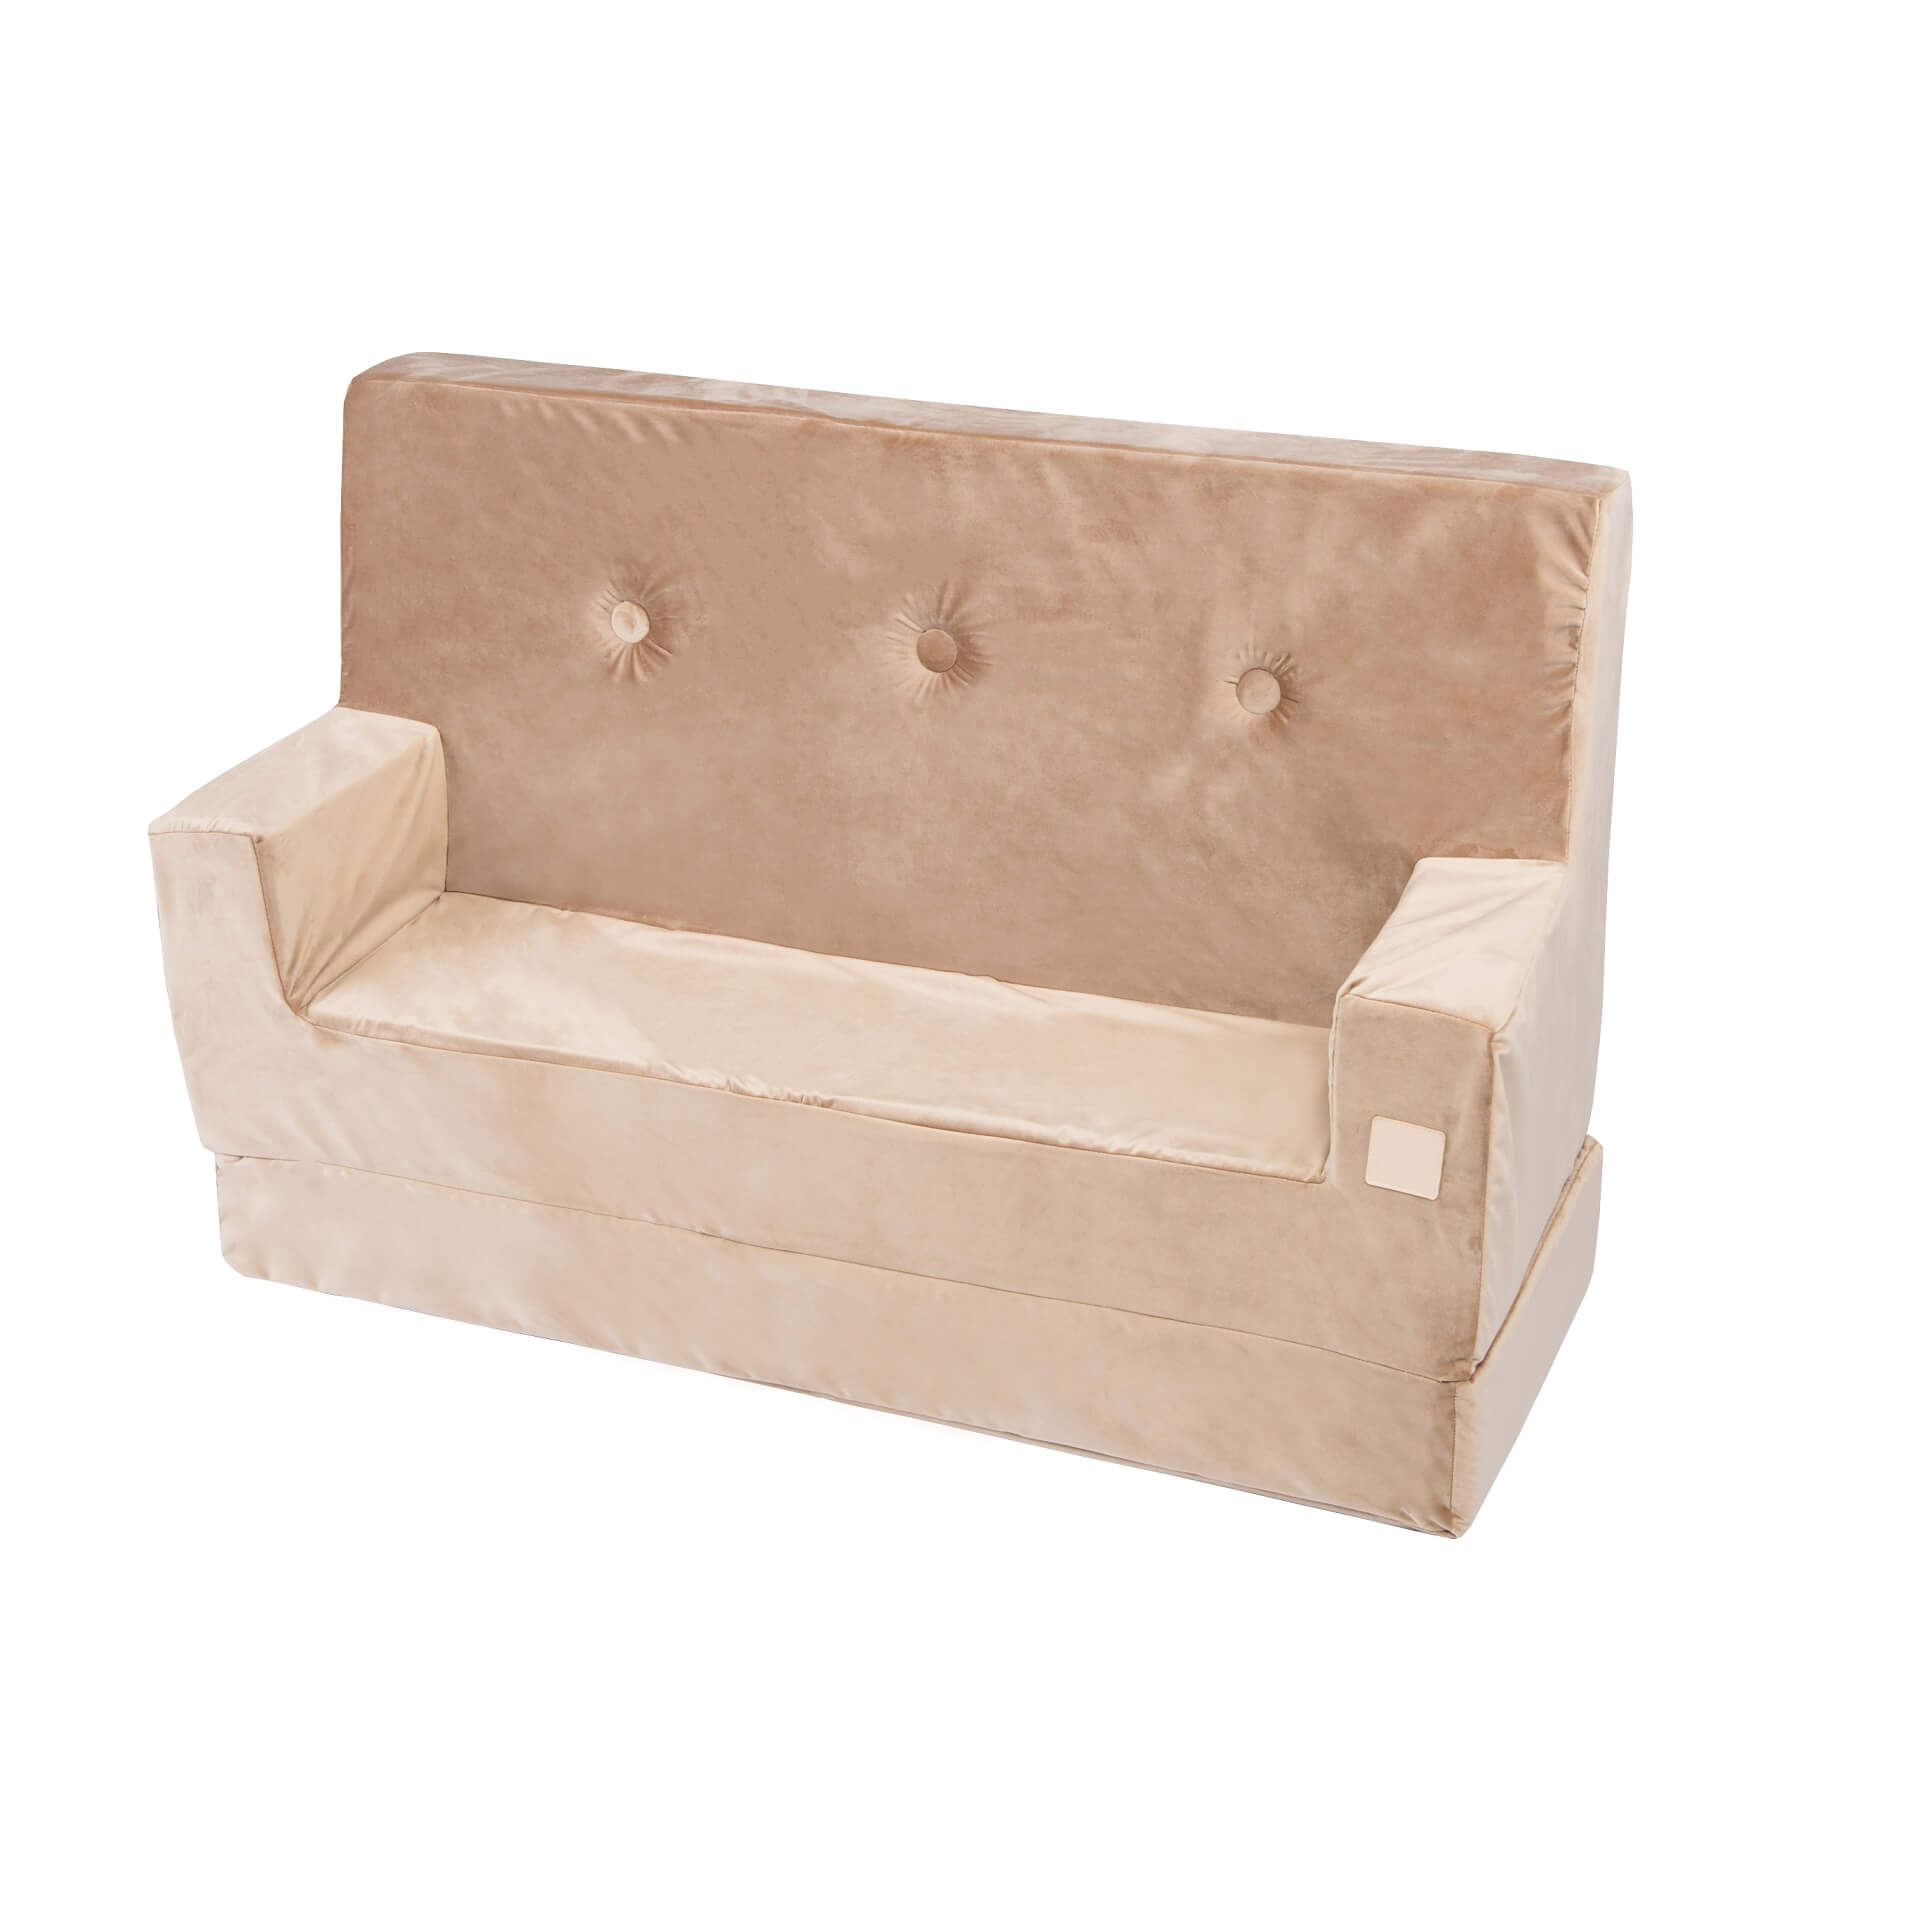 Foldie - Klappbare Kindermöbel